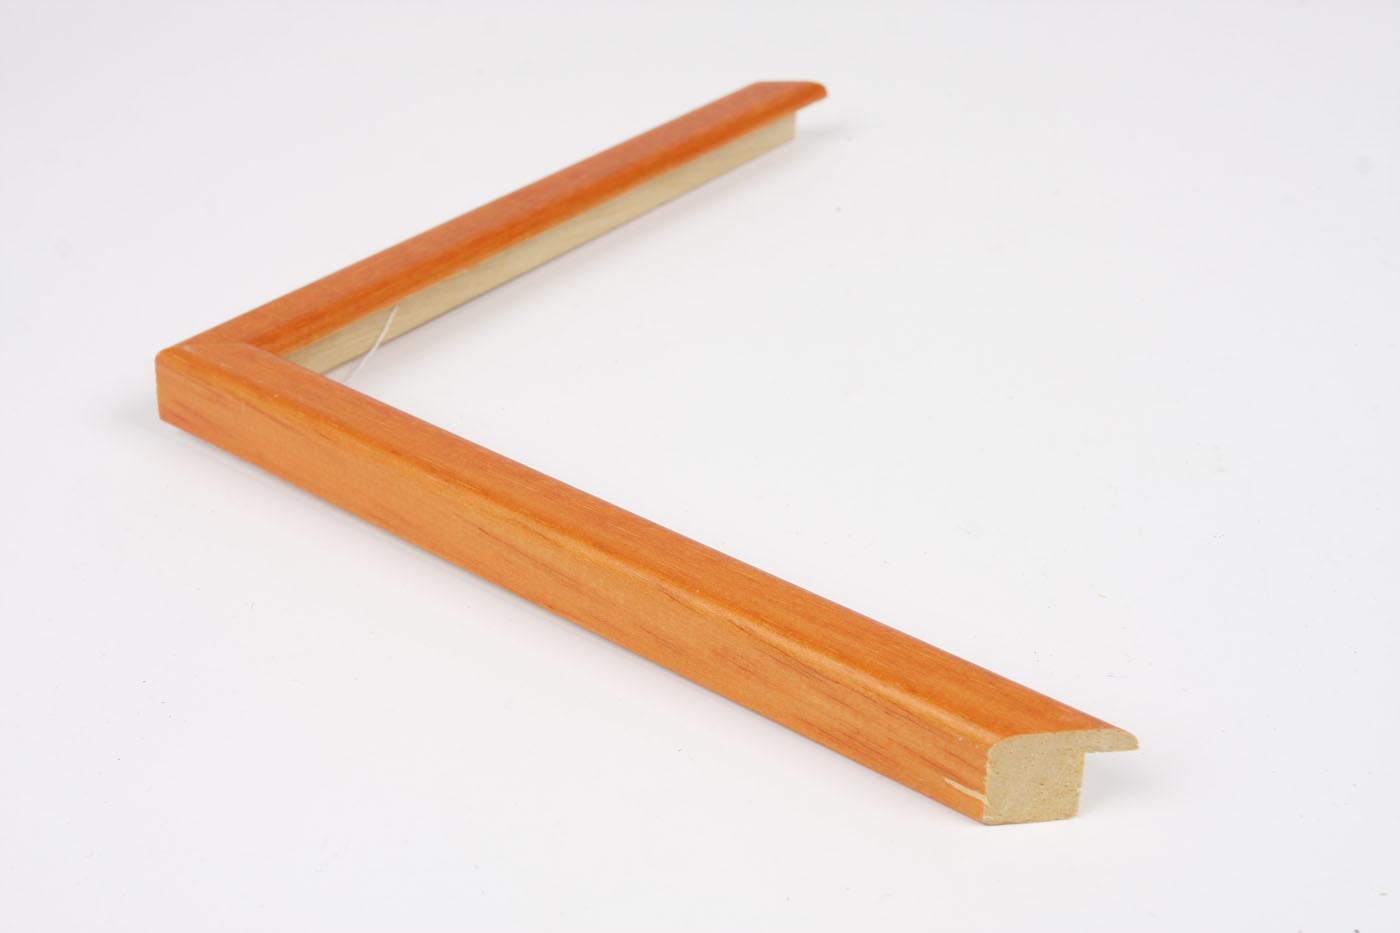 04142-112-NARANJA-ancho1,5cm-perfil